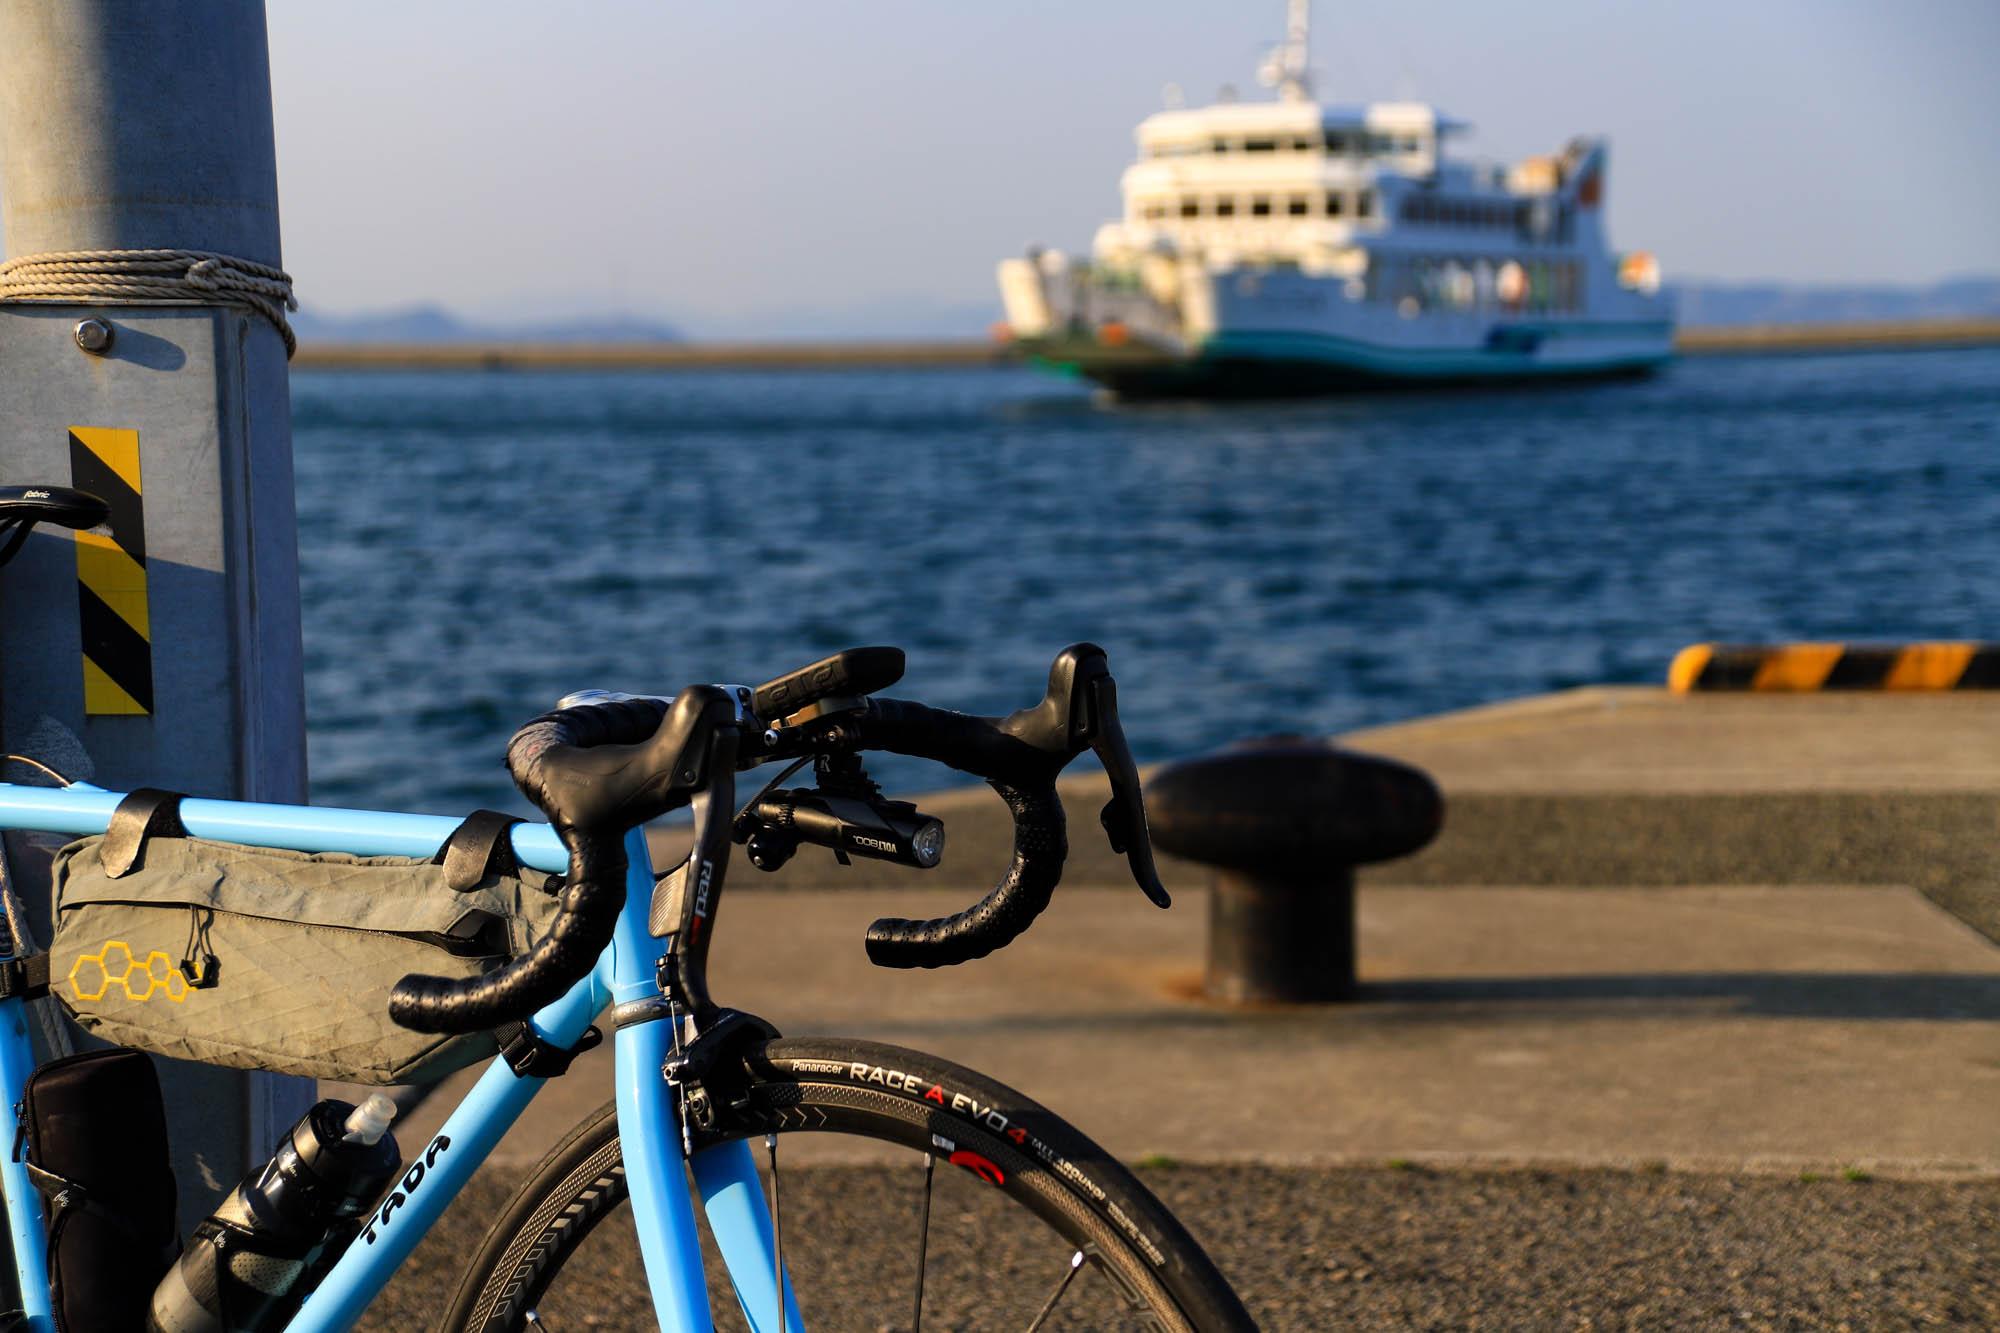 takagisan_ferry-1.jpg